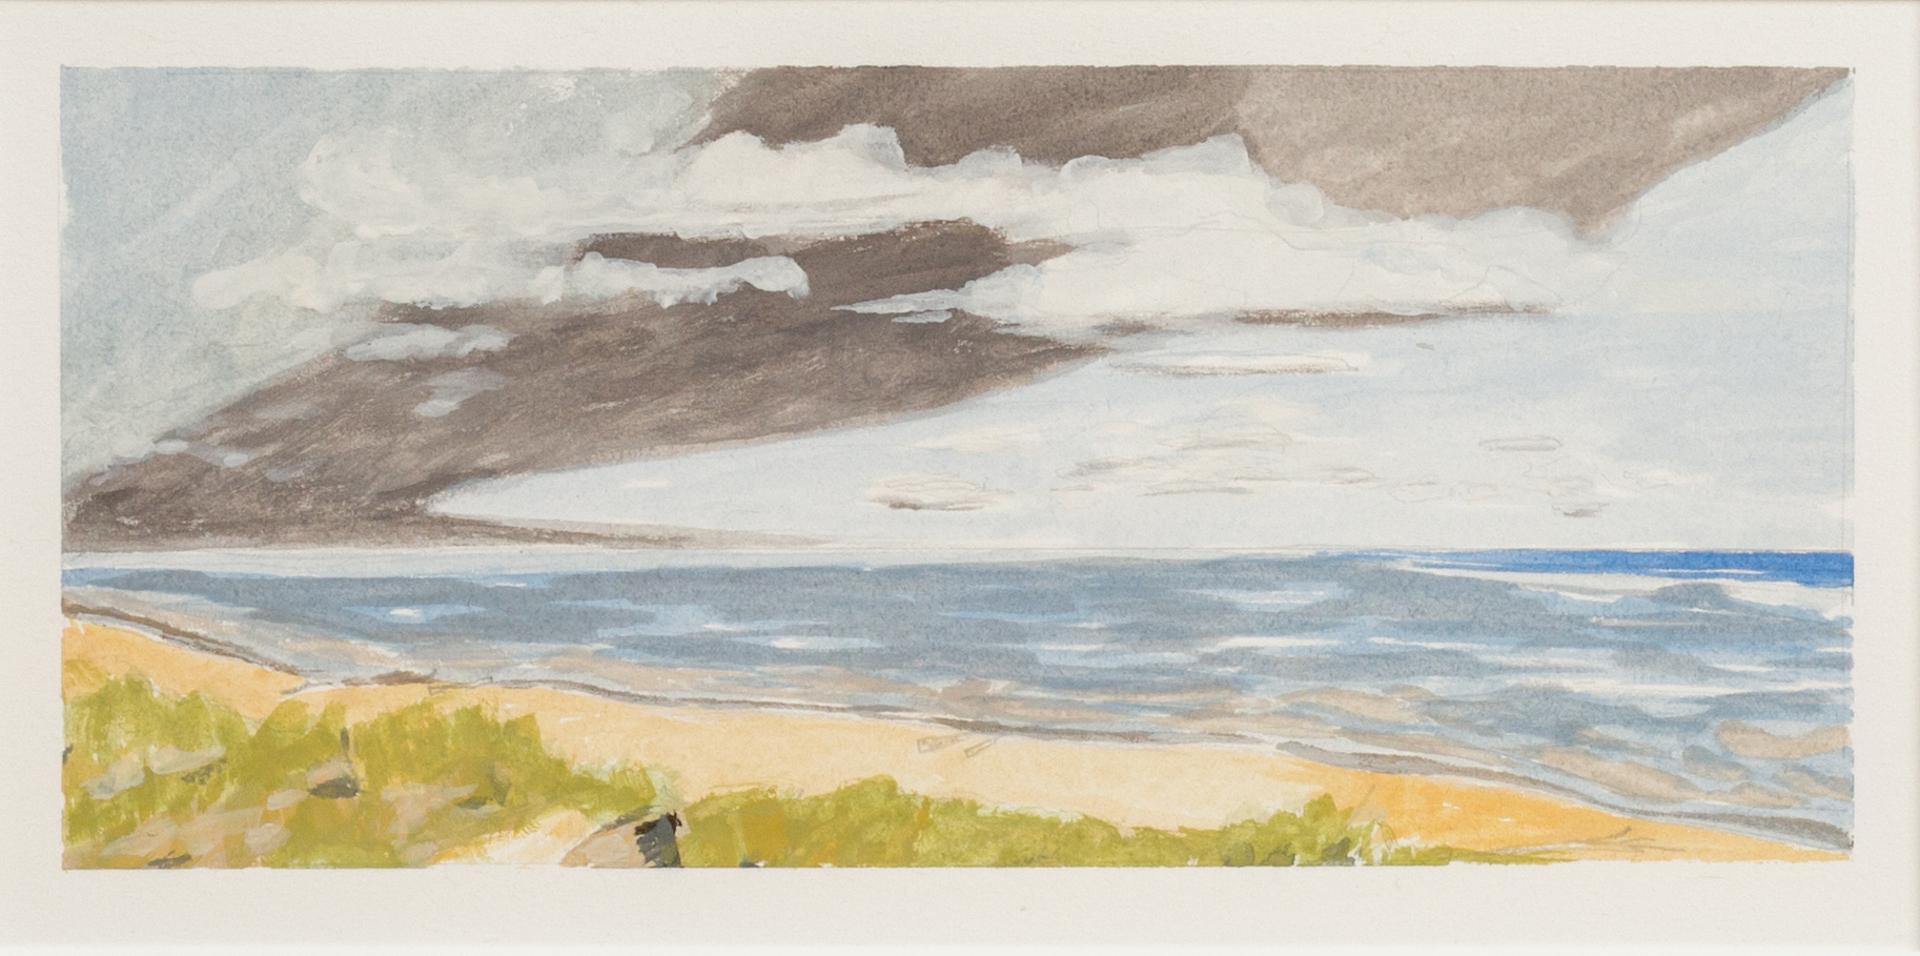 Beach Day by Matthew Swanson